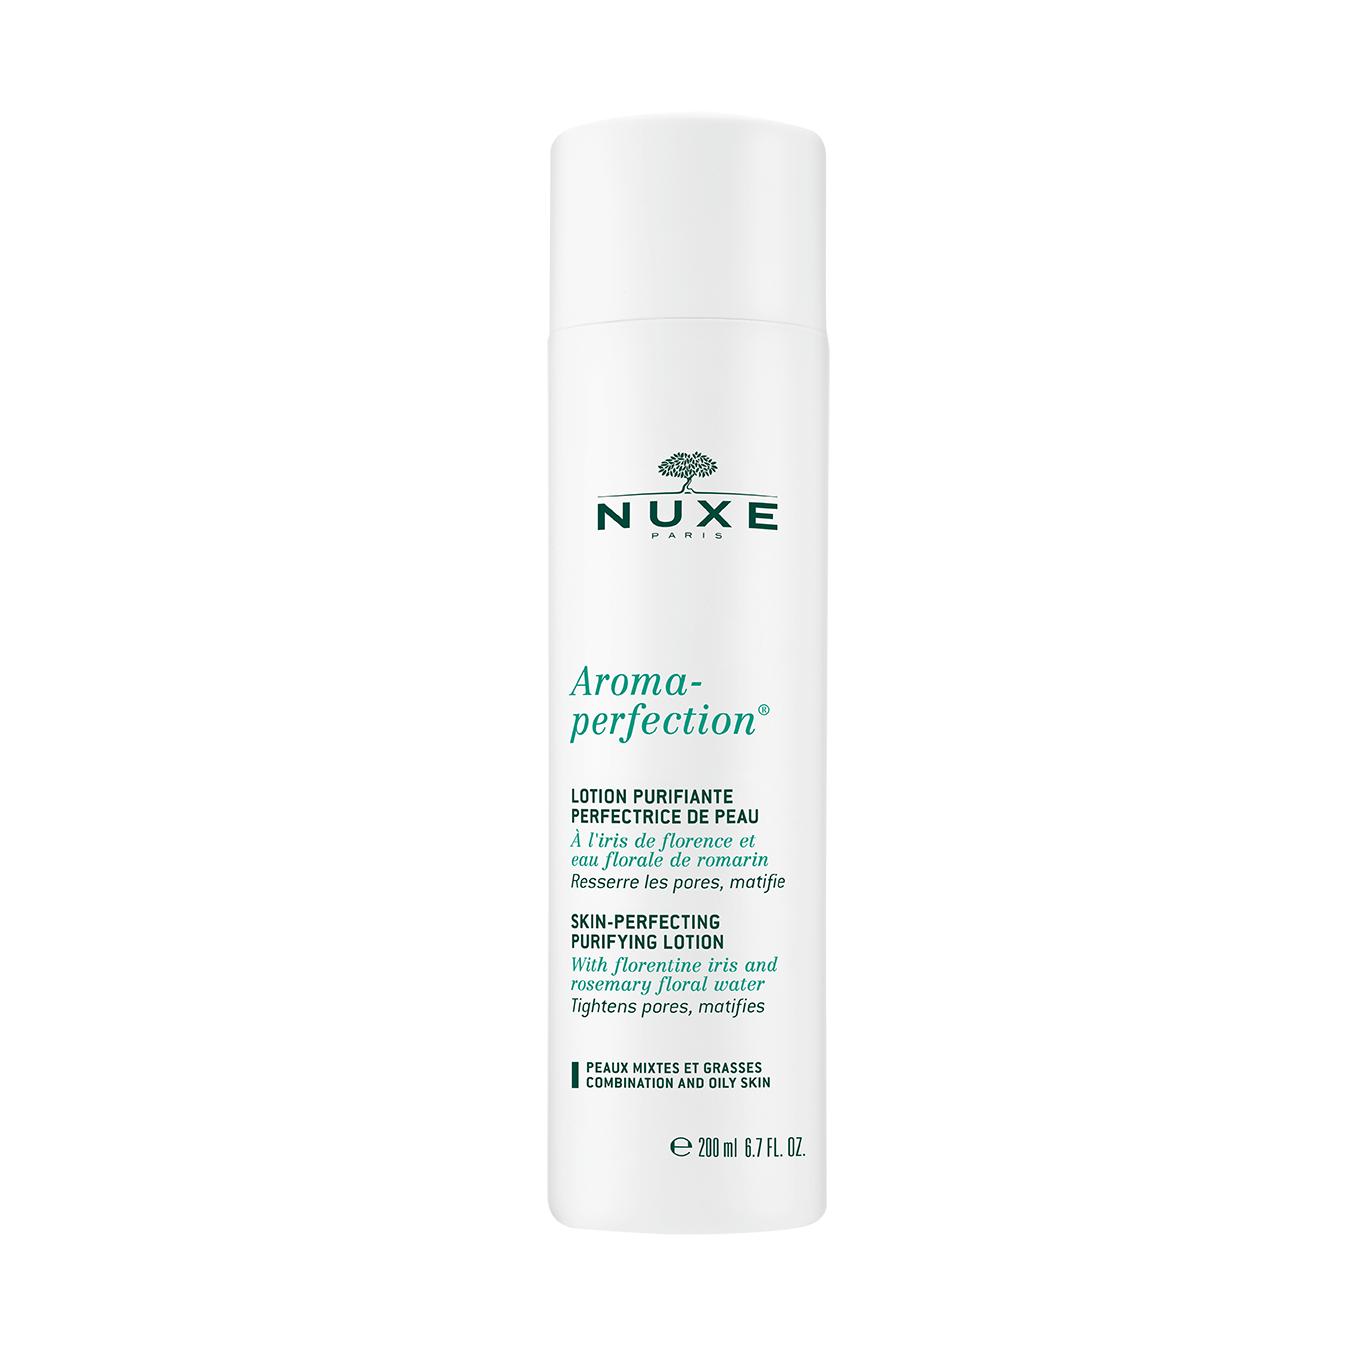 Nuxe Aroma-Perfection Lotion Purifiante Perfectrice – Λοσιόν Καθαρισμού για το Μεικτό και Λιπαρό Δέρμα 200ml